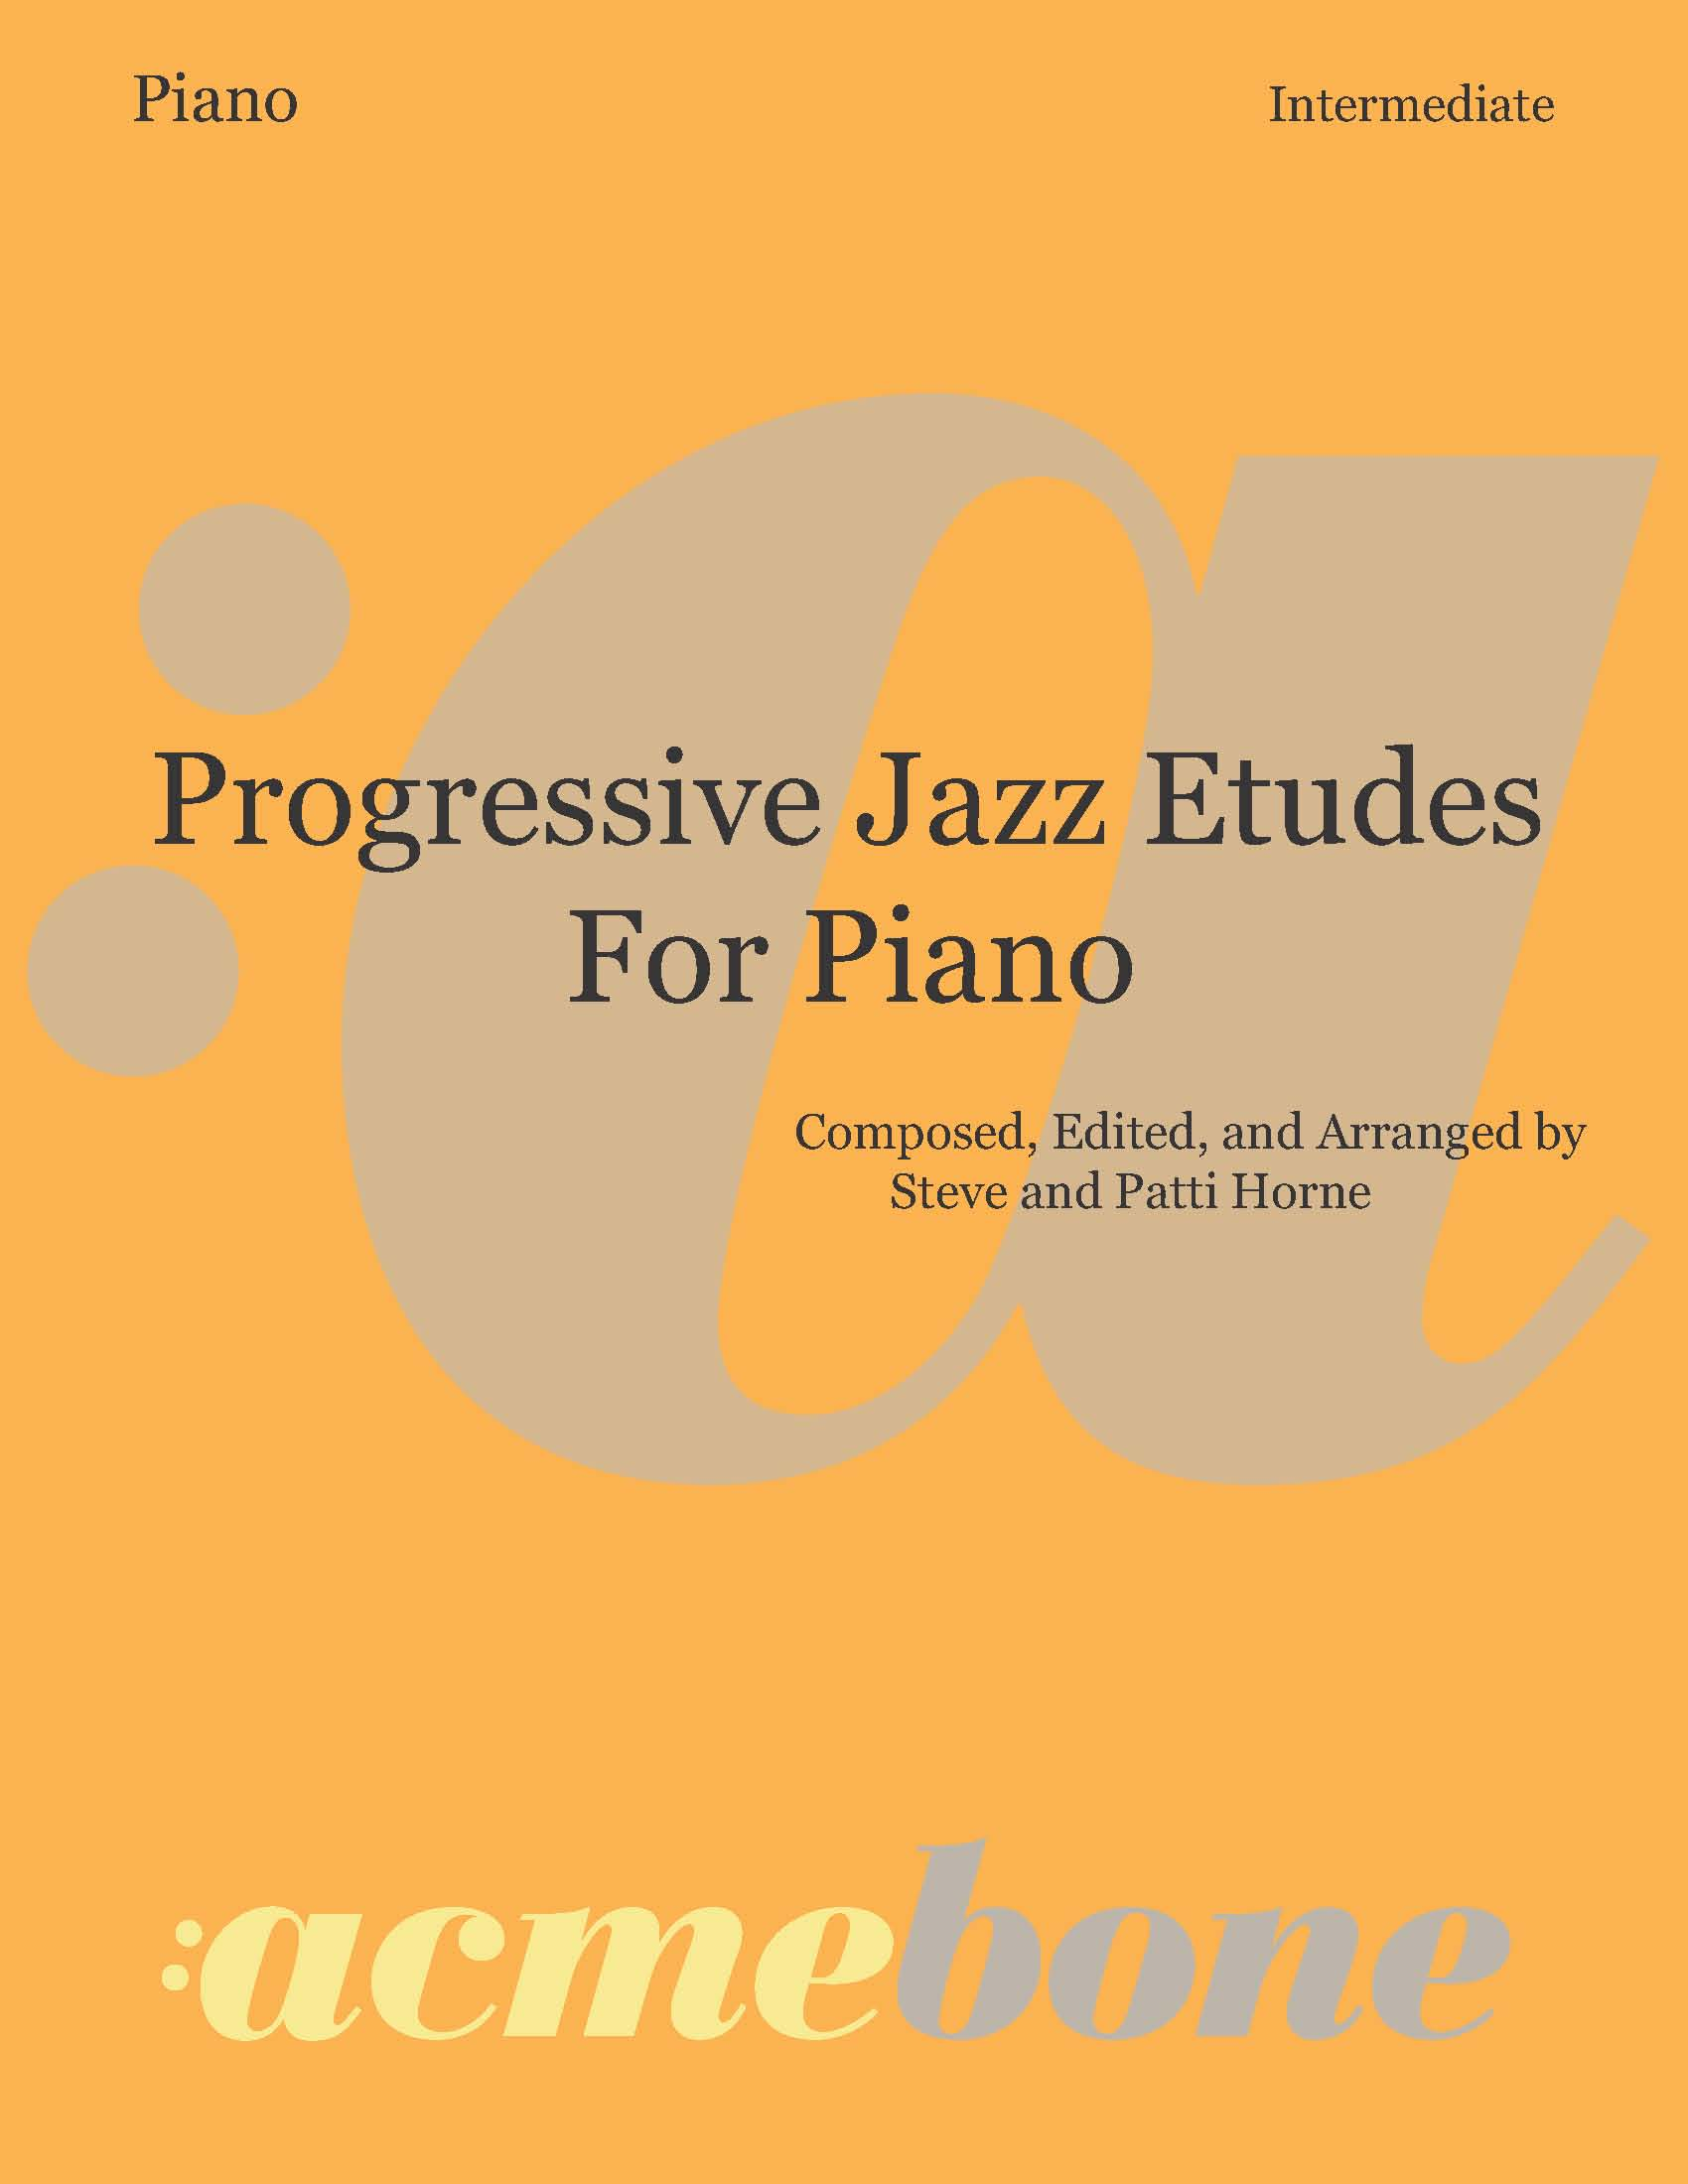 Piano Etudes_cover_bk2.jpg